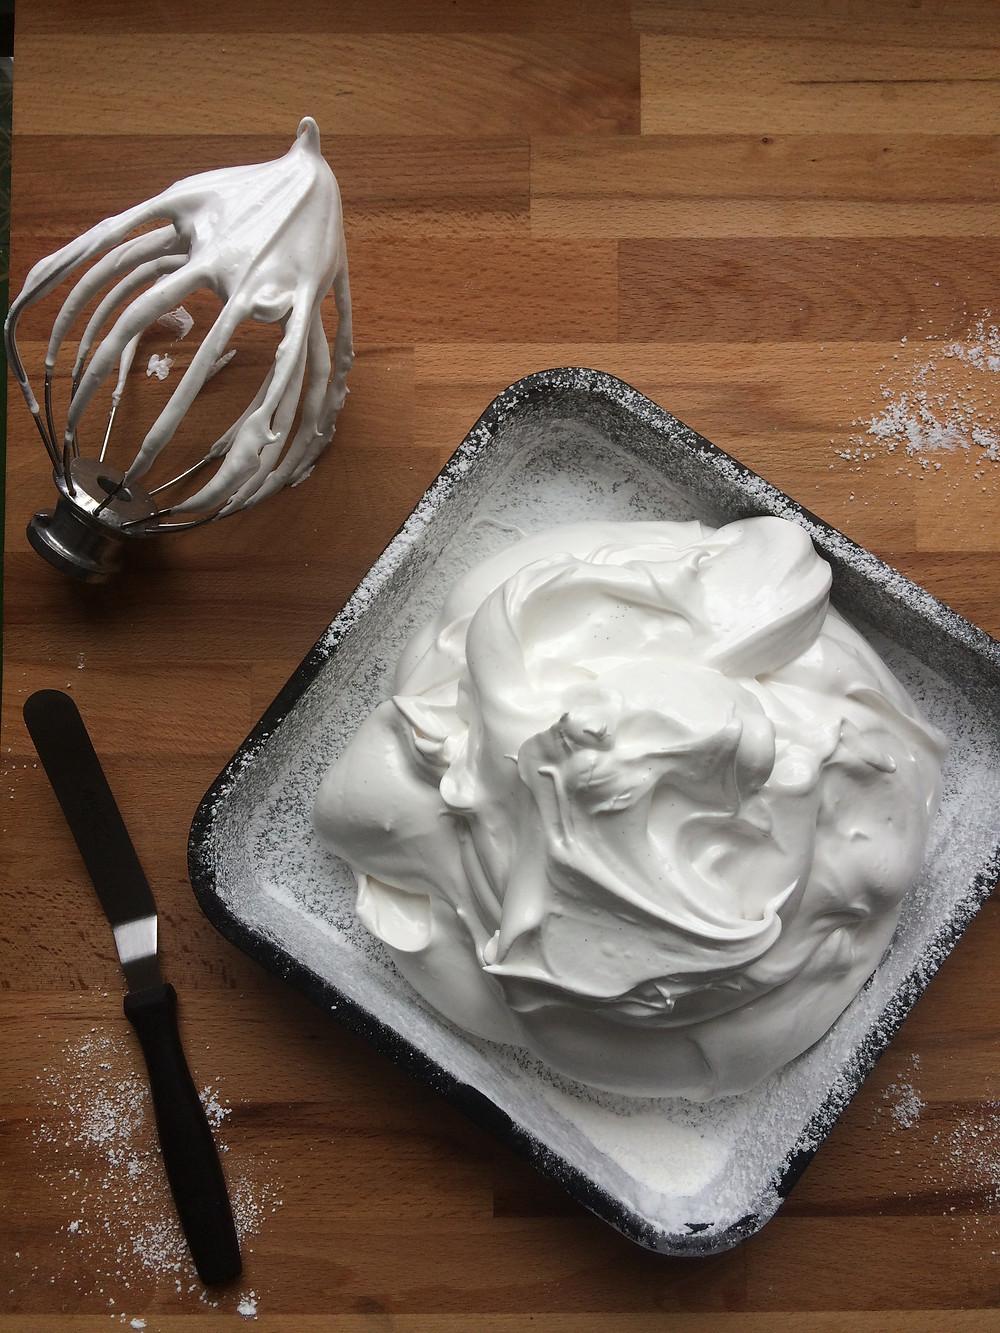 Marshmallow - Sky Meadow Bakery blog